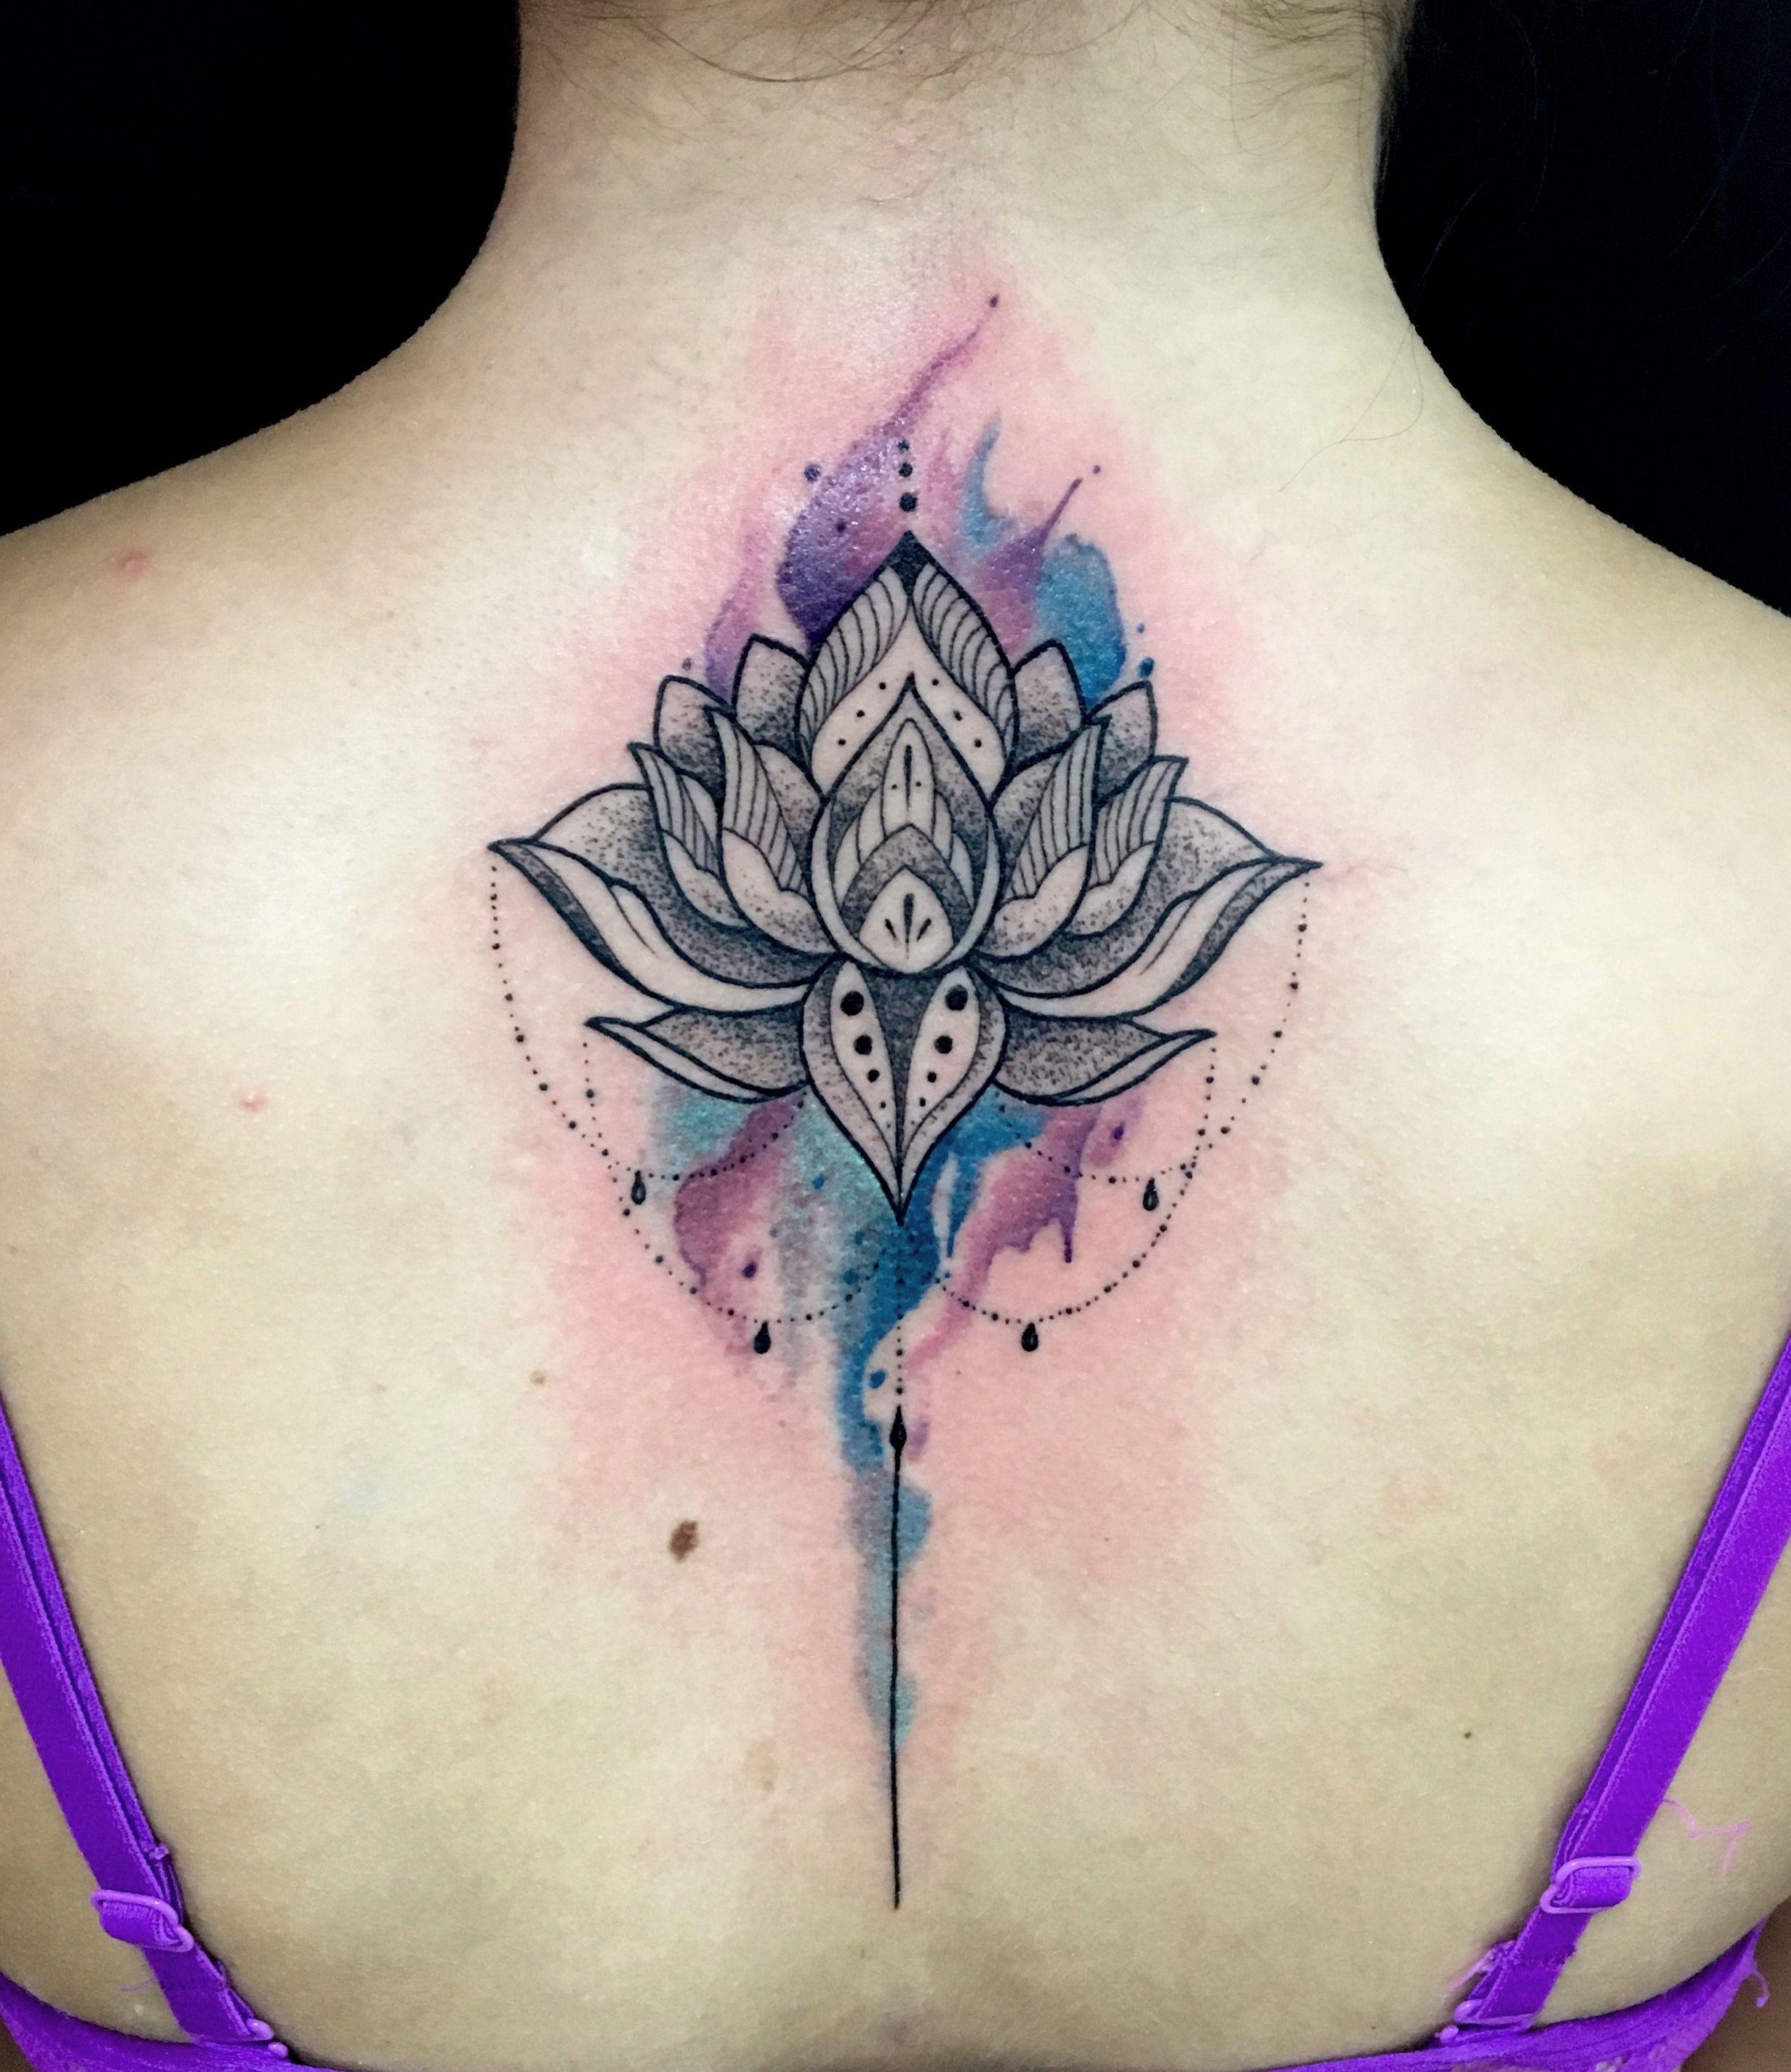 Lotus flower tattoo watercolor By Juan david Castro R Tattoo 2016